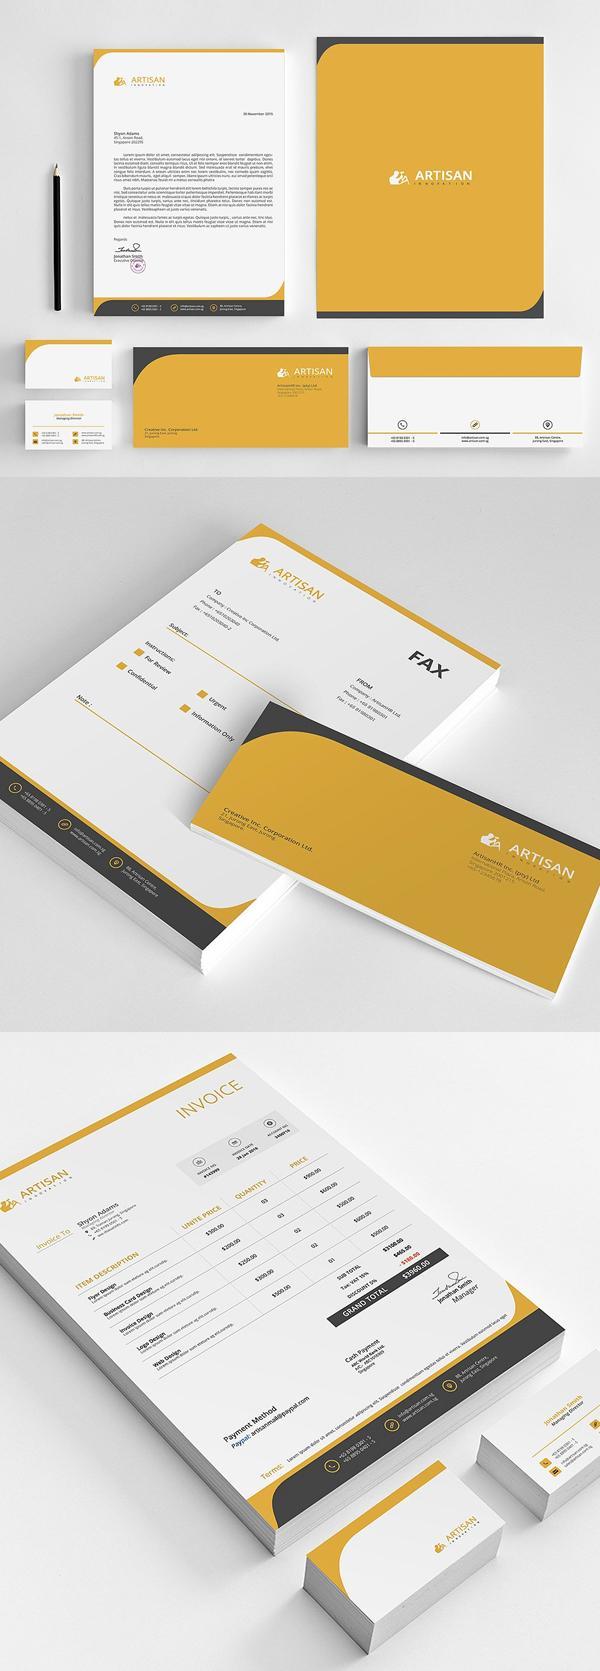 Modern Business Branding / Stationery Templates Design - 15